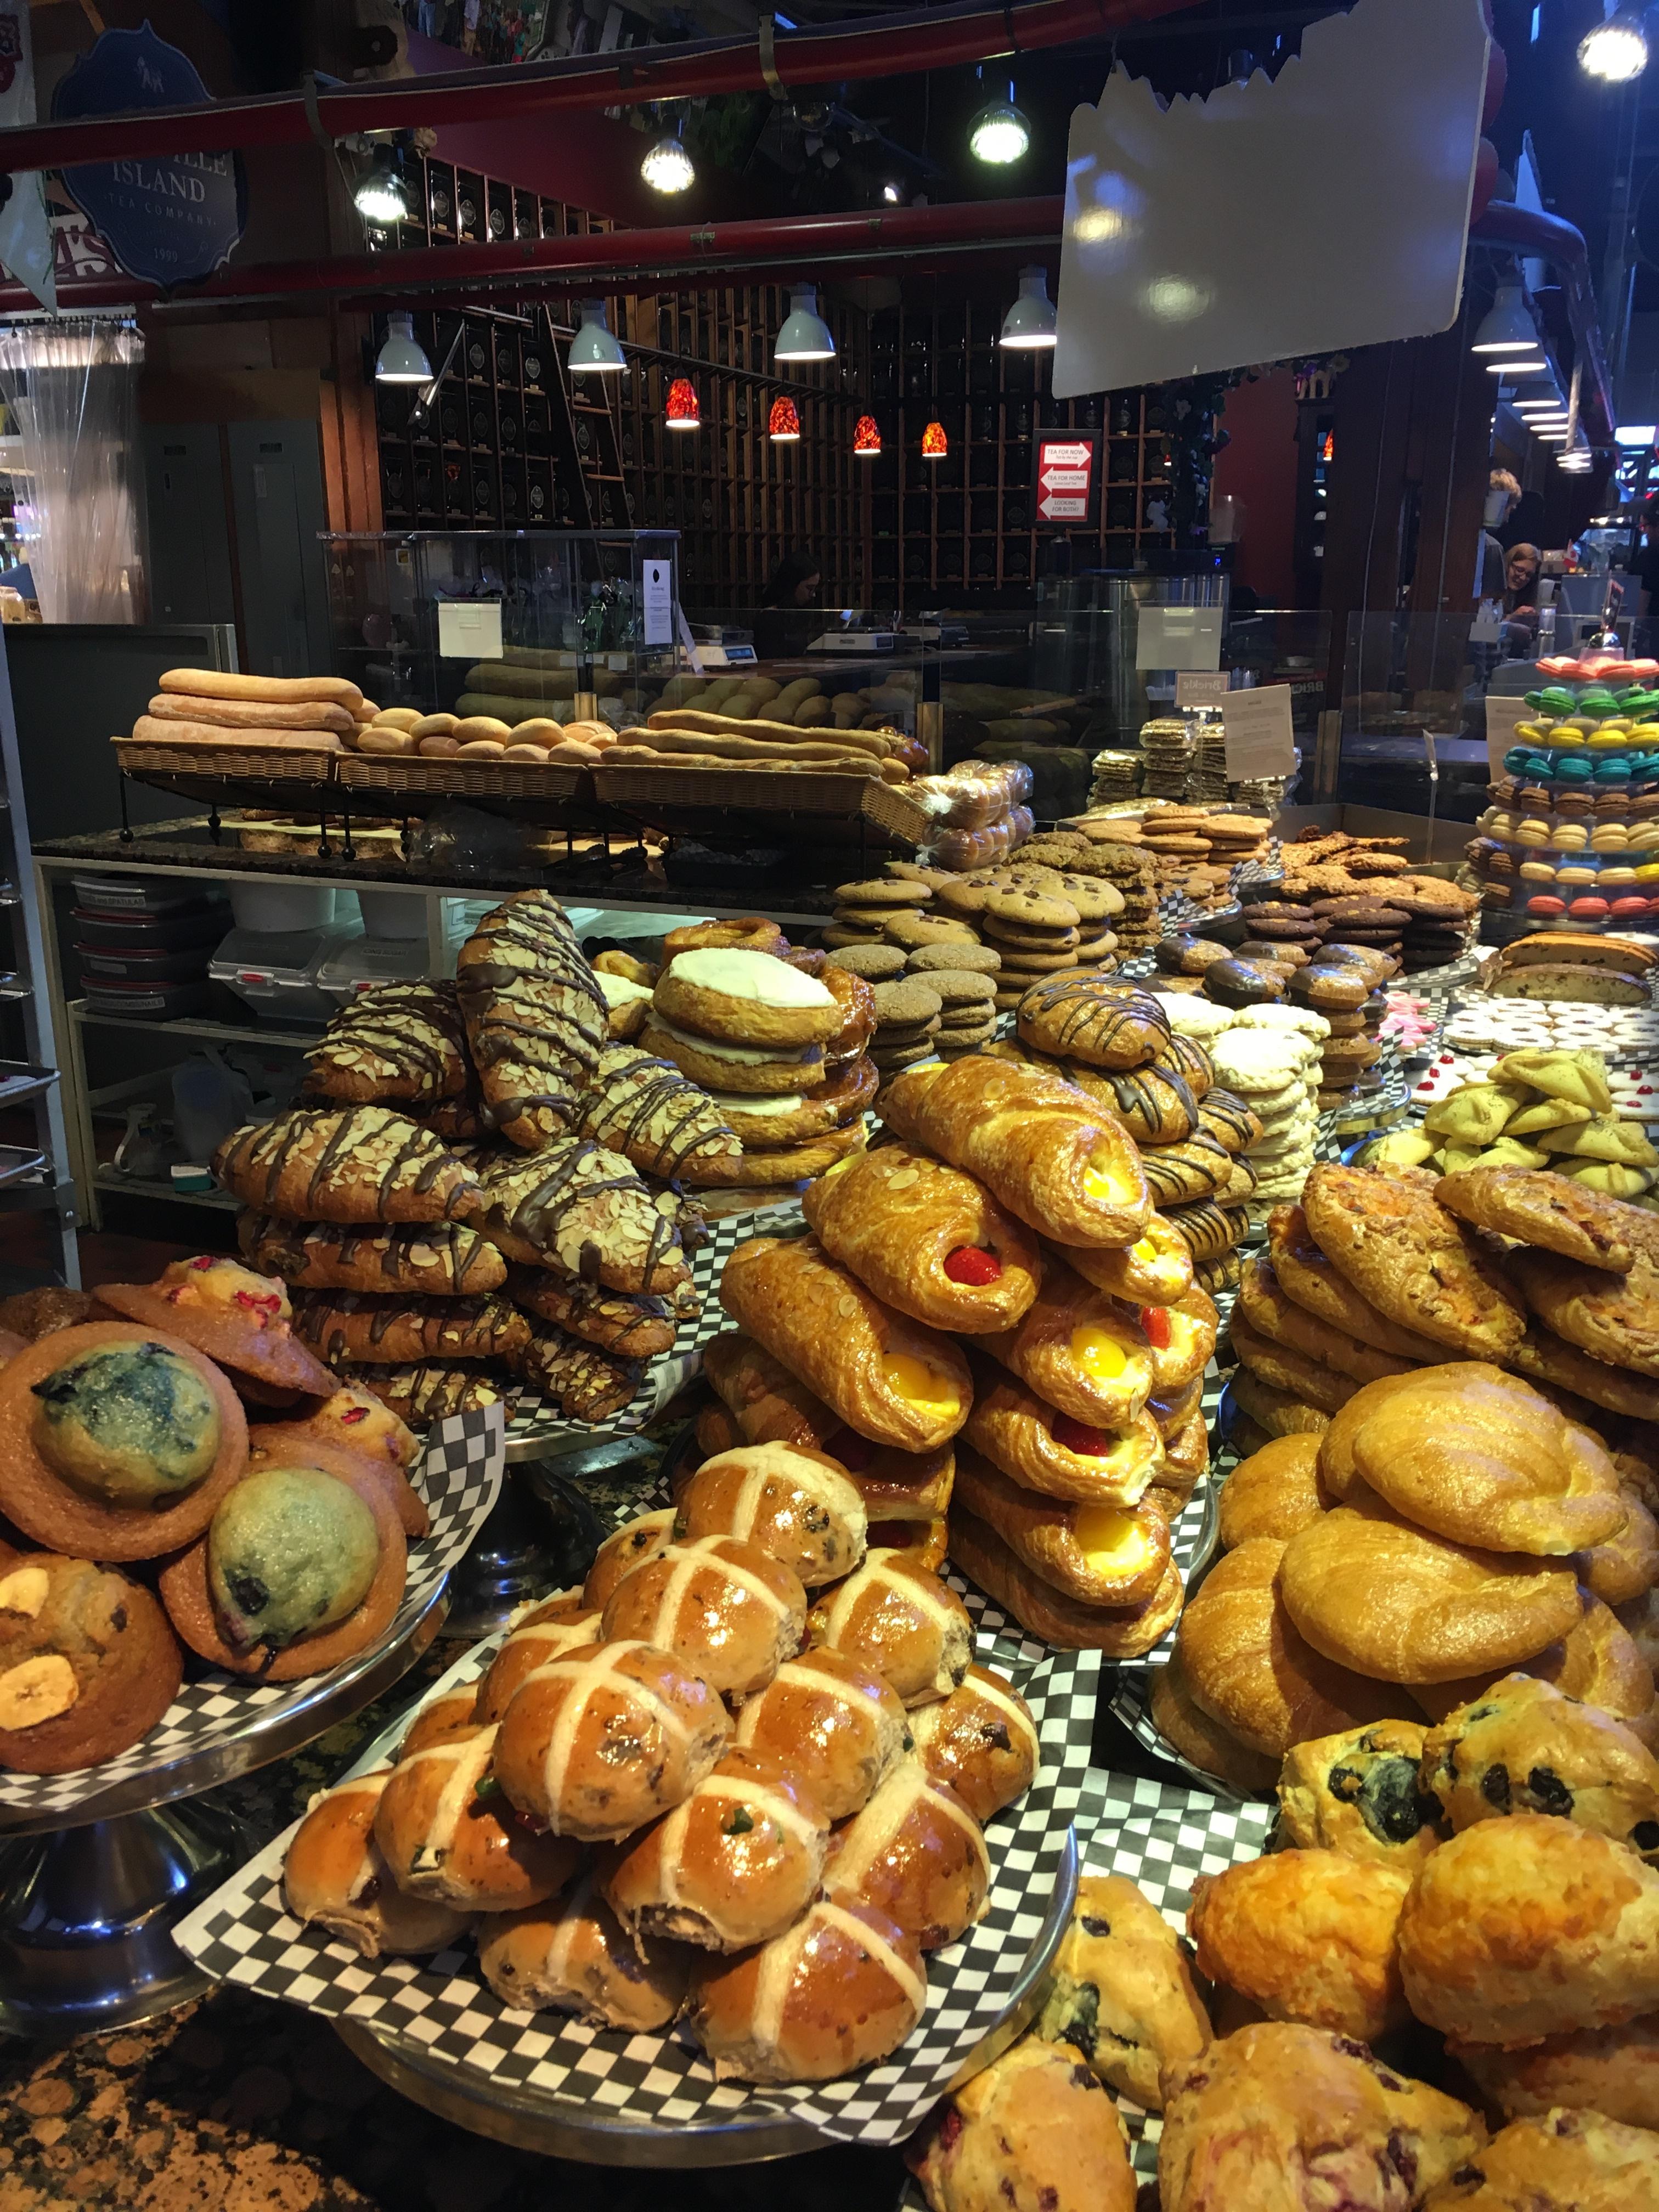 Pastries Granville Island Public Market